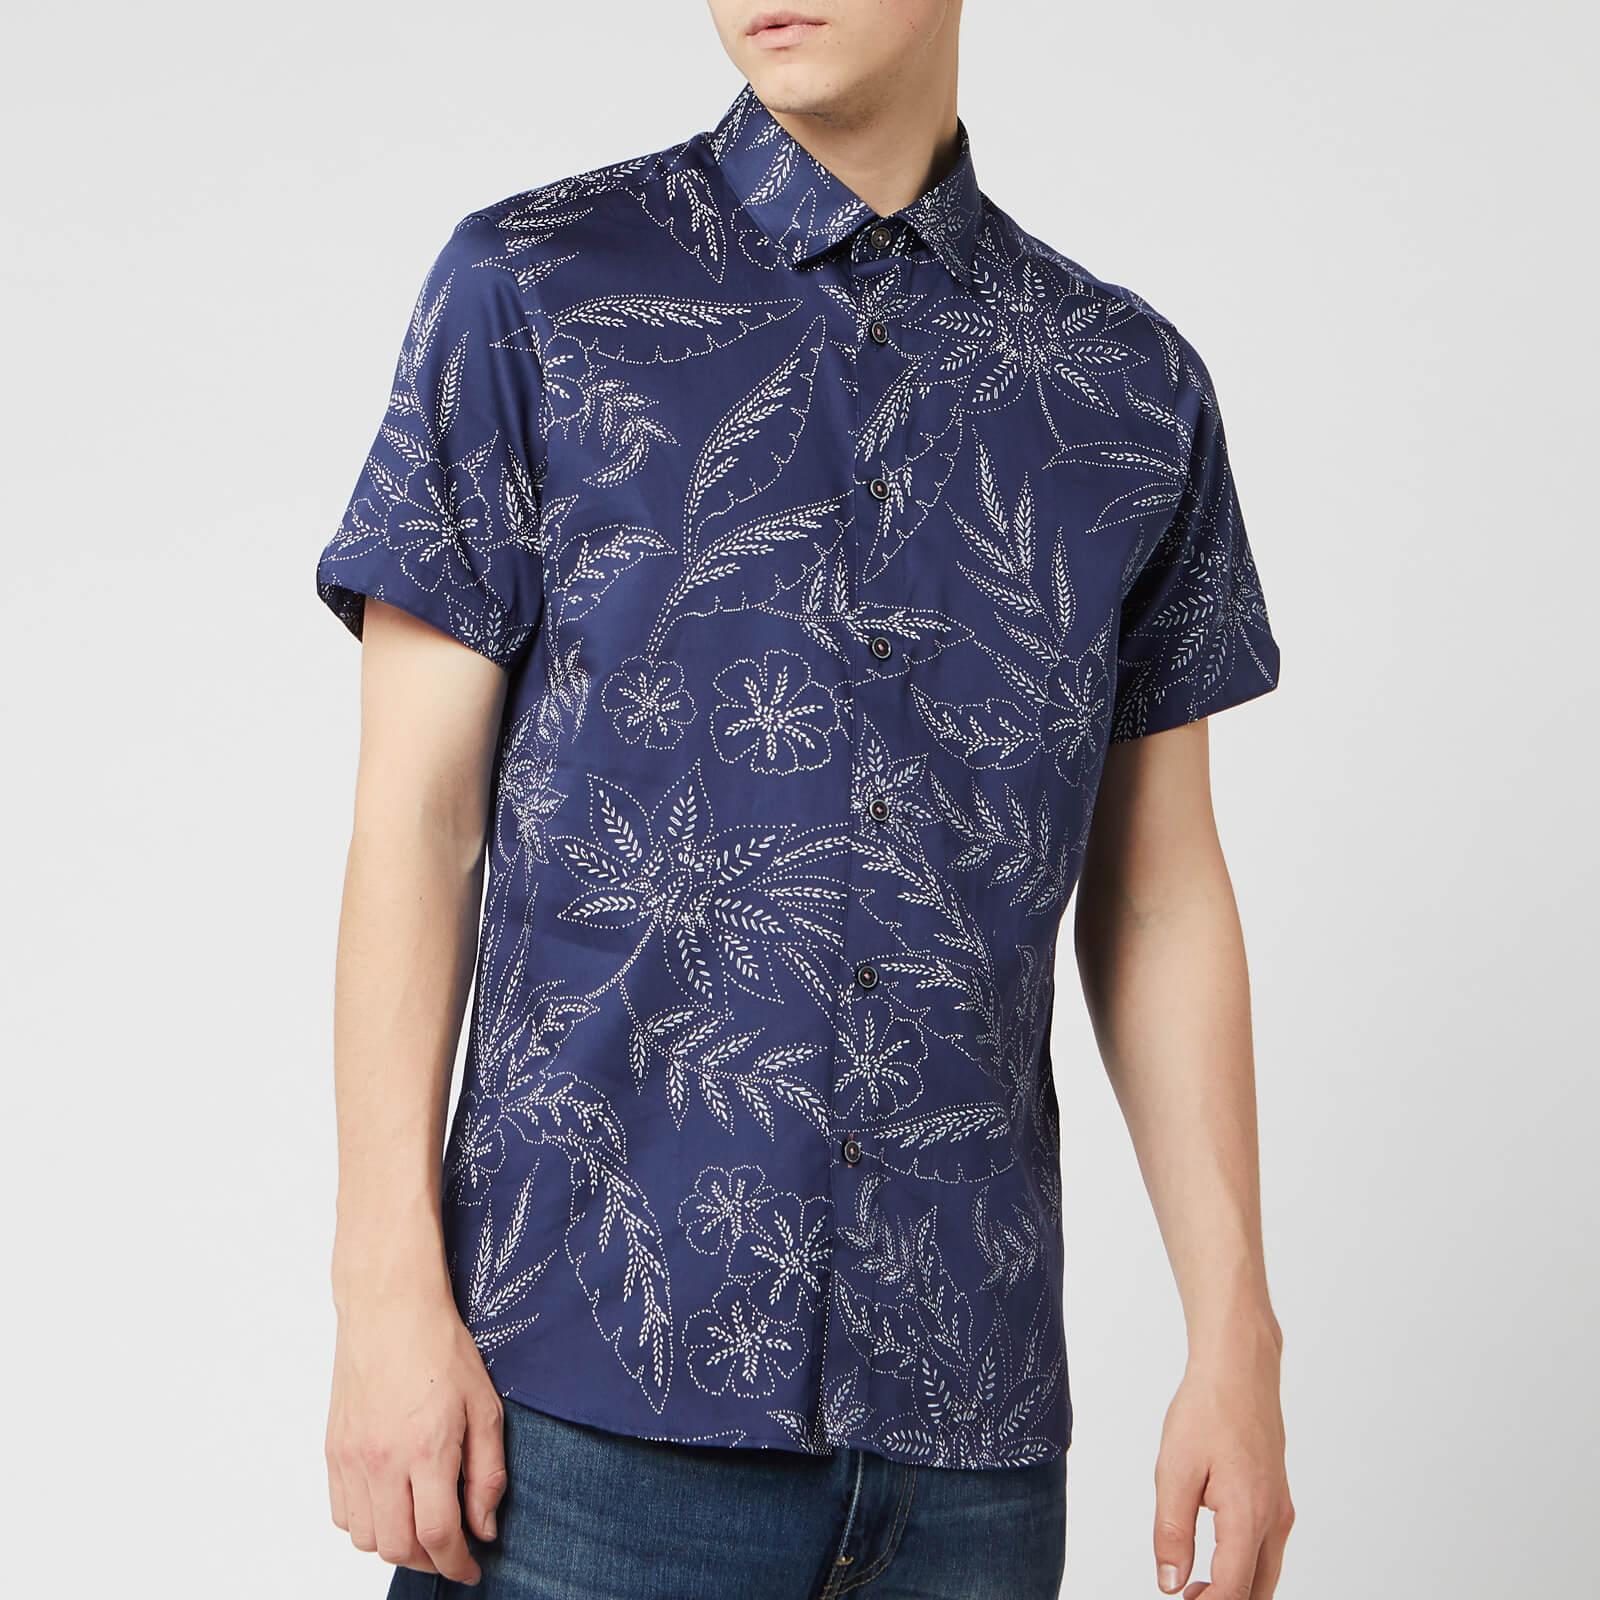 Ted Baker Men's Damiem Short Sleeve Shirt - Navy - M/3